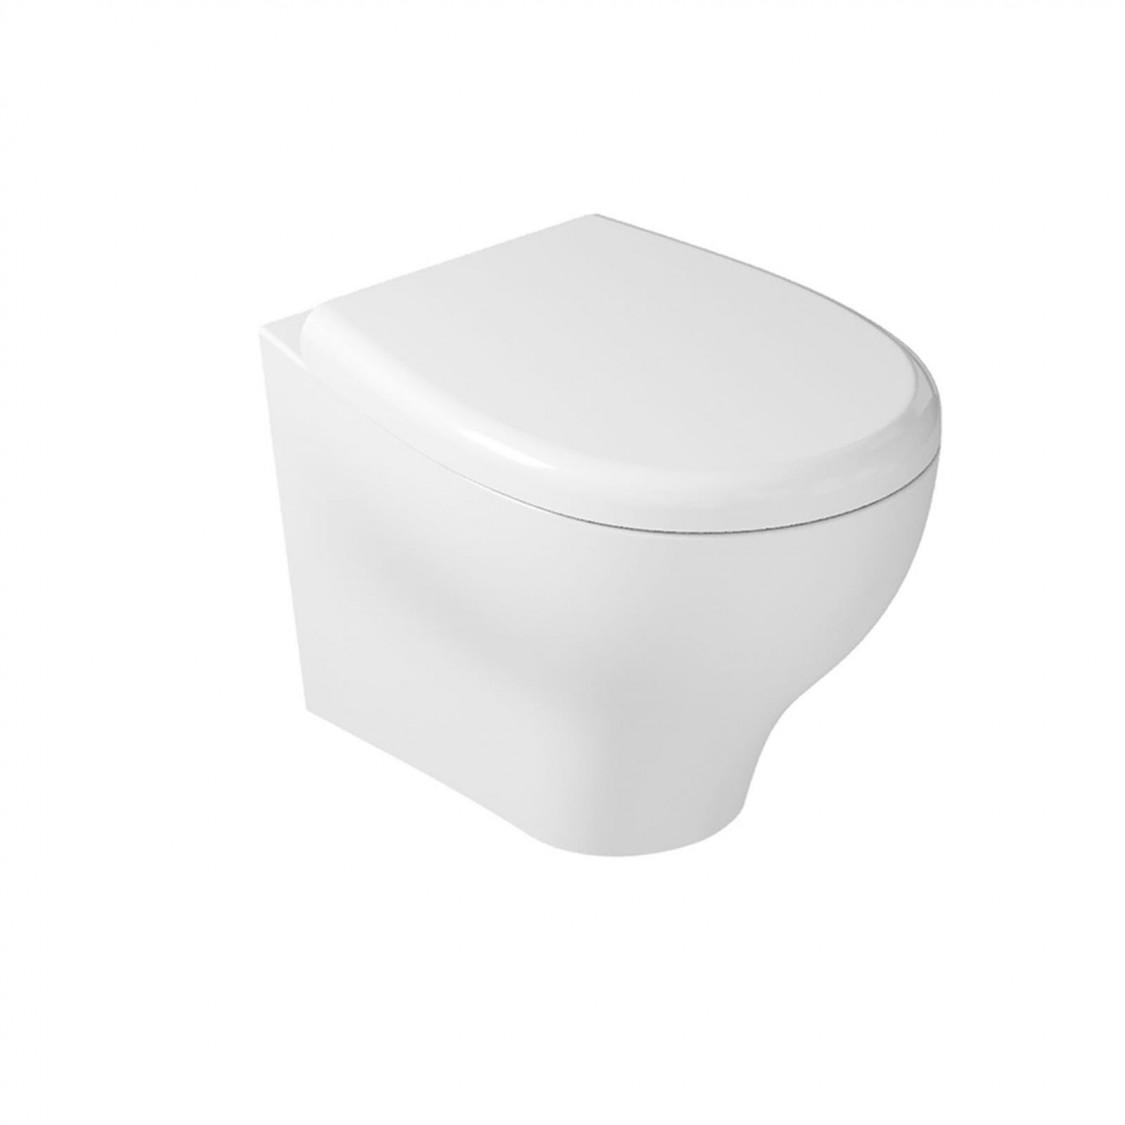 Vaso sospeso filo parete rimless in ceramica bianco lucido con sedile avvolgente